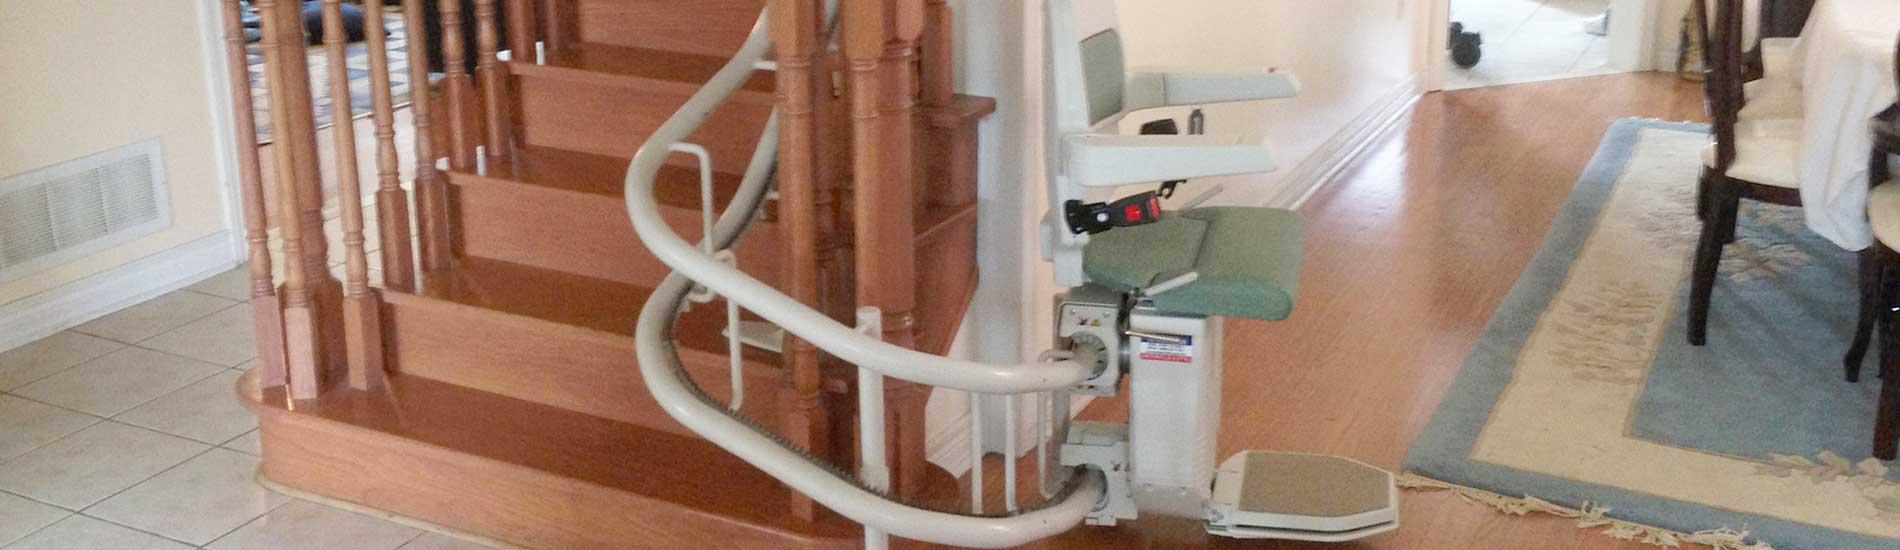 Treppenlift Bauarten